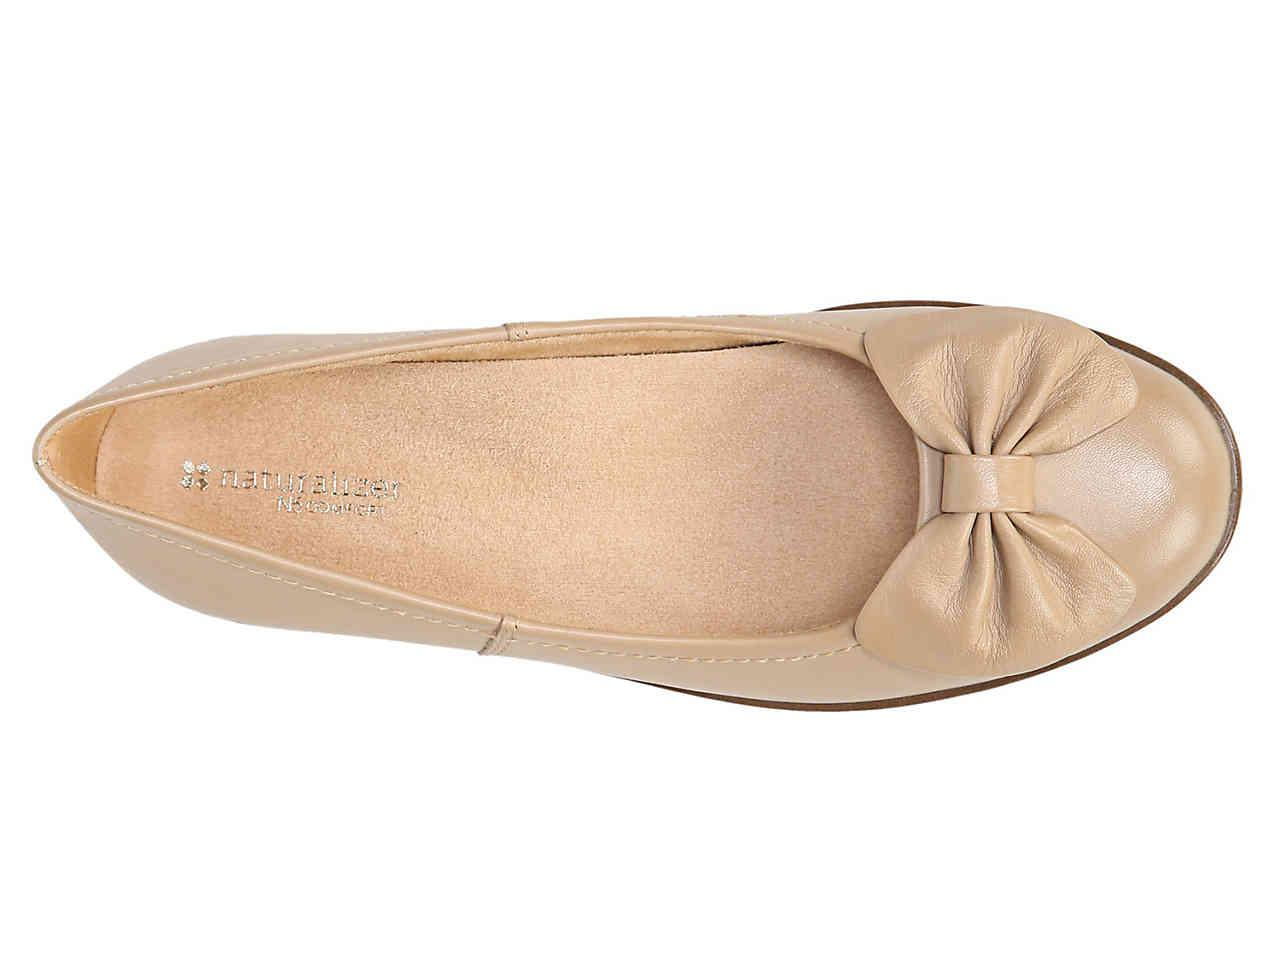 7ad3853927 Lyst - Naturalizer Fresno Ballet Flat in Natural